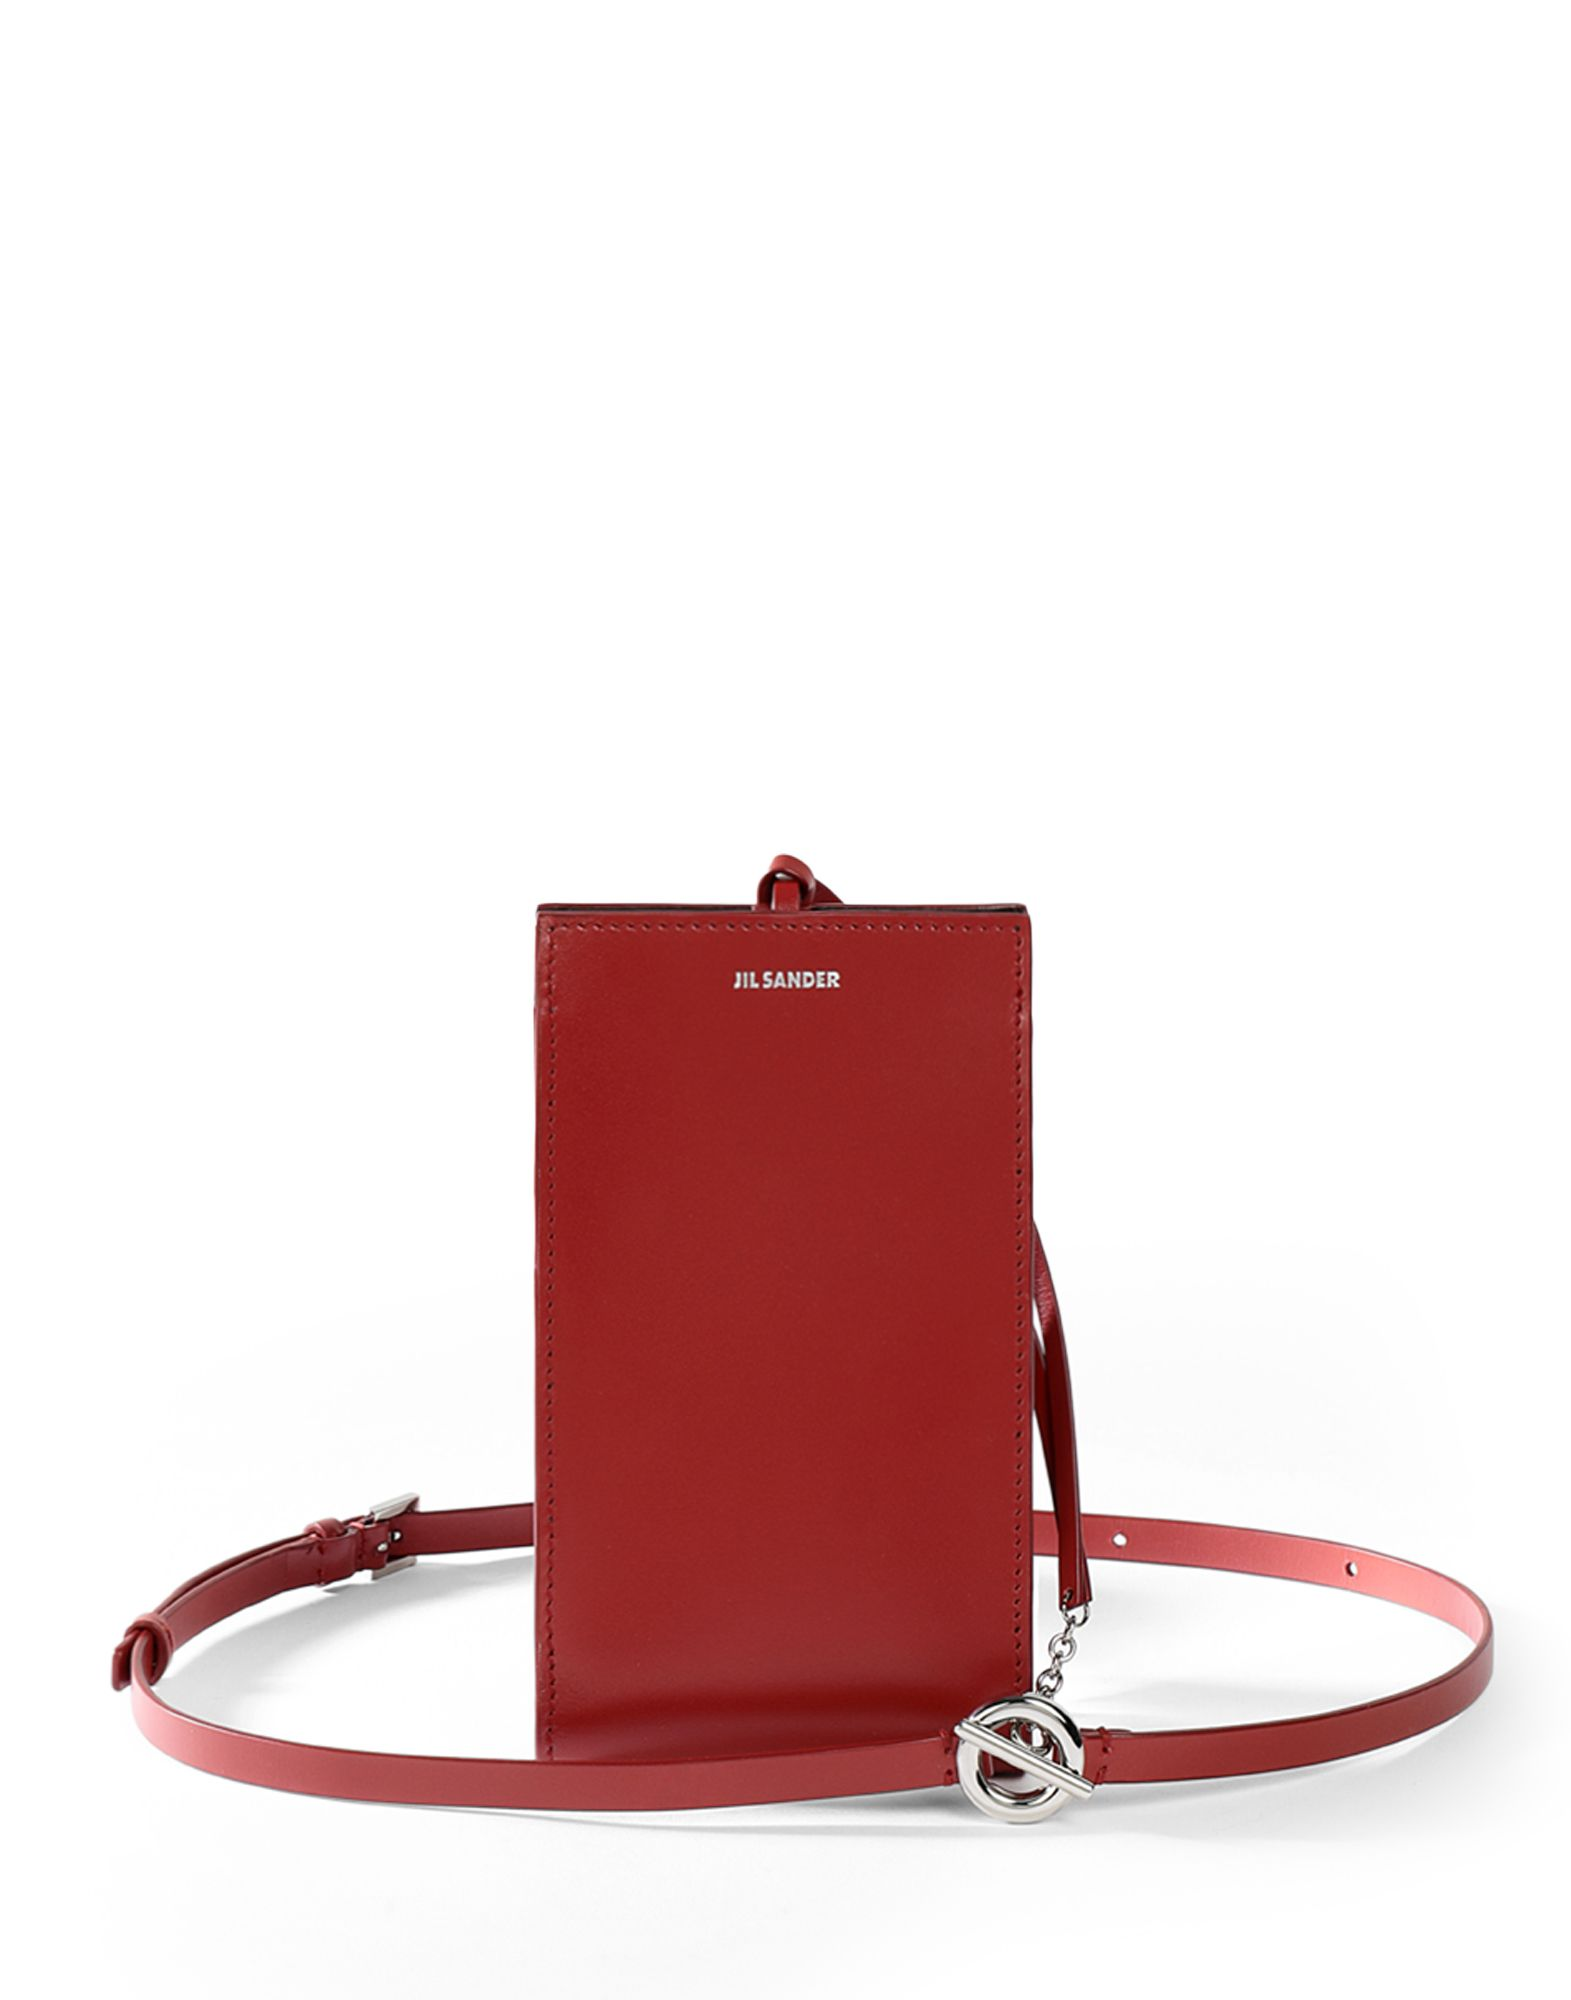 Cintura - JIL SANDER Online Store